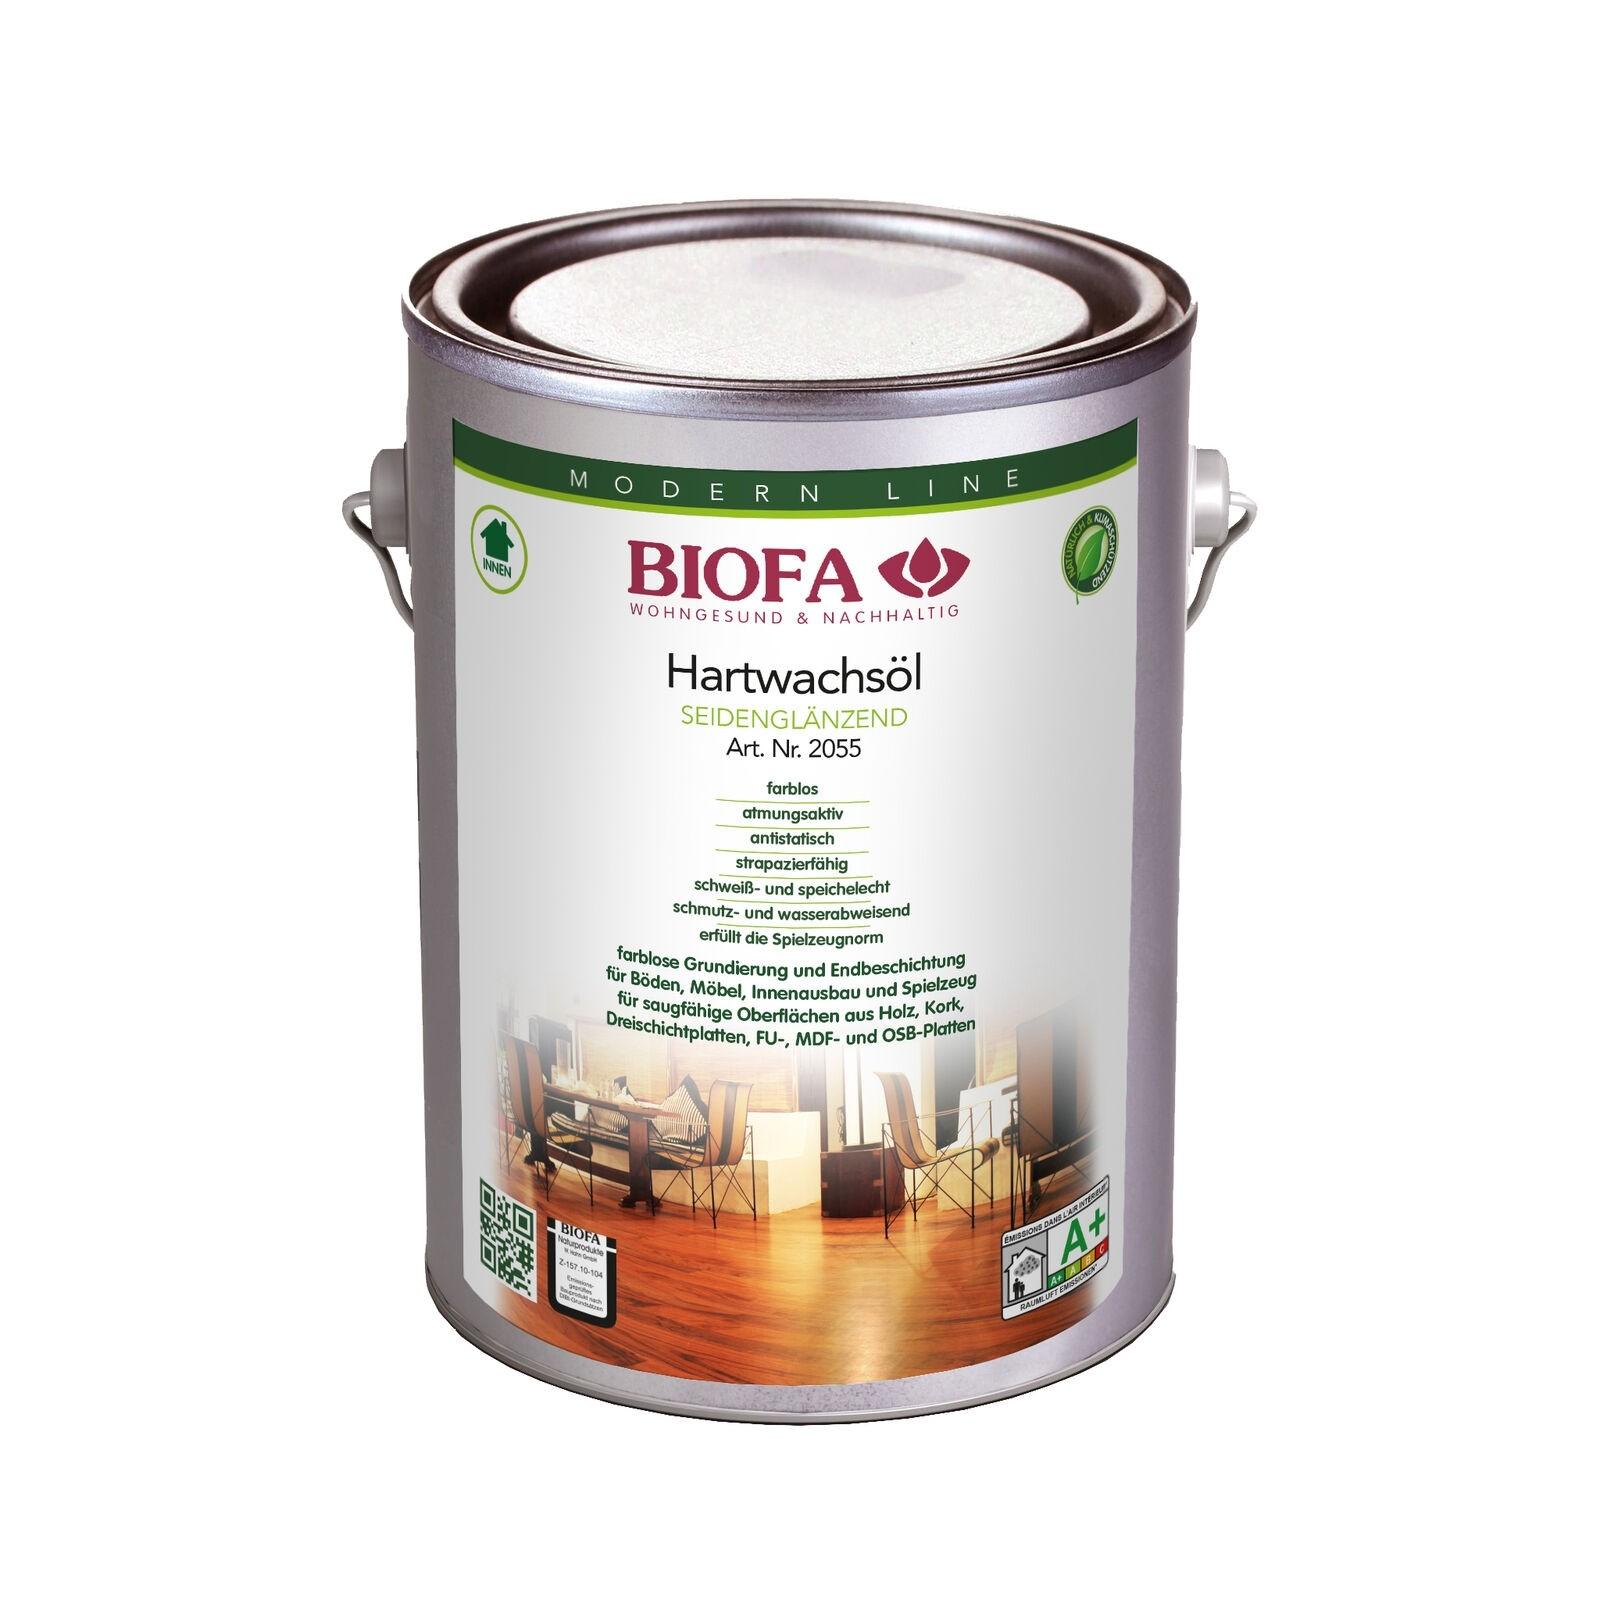 BIOFA Hartwachsöl, seidenglänzend 2,5 l